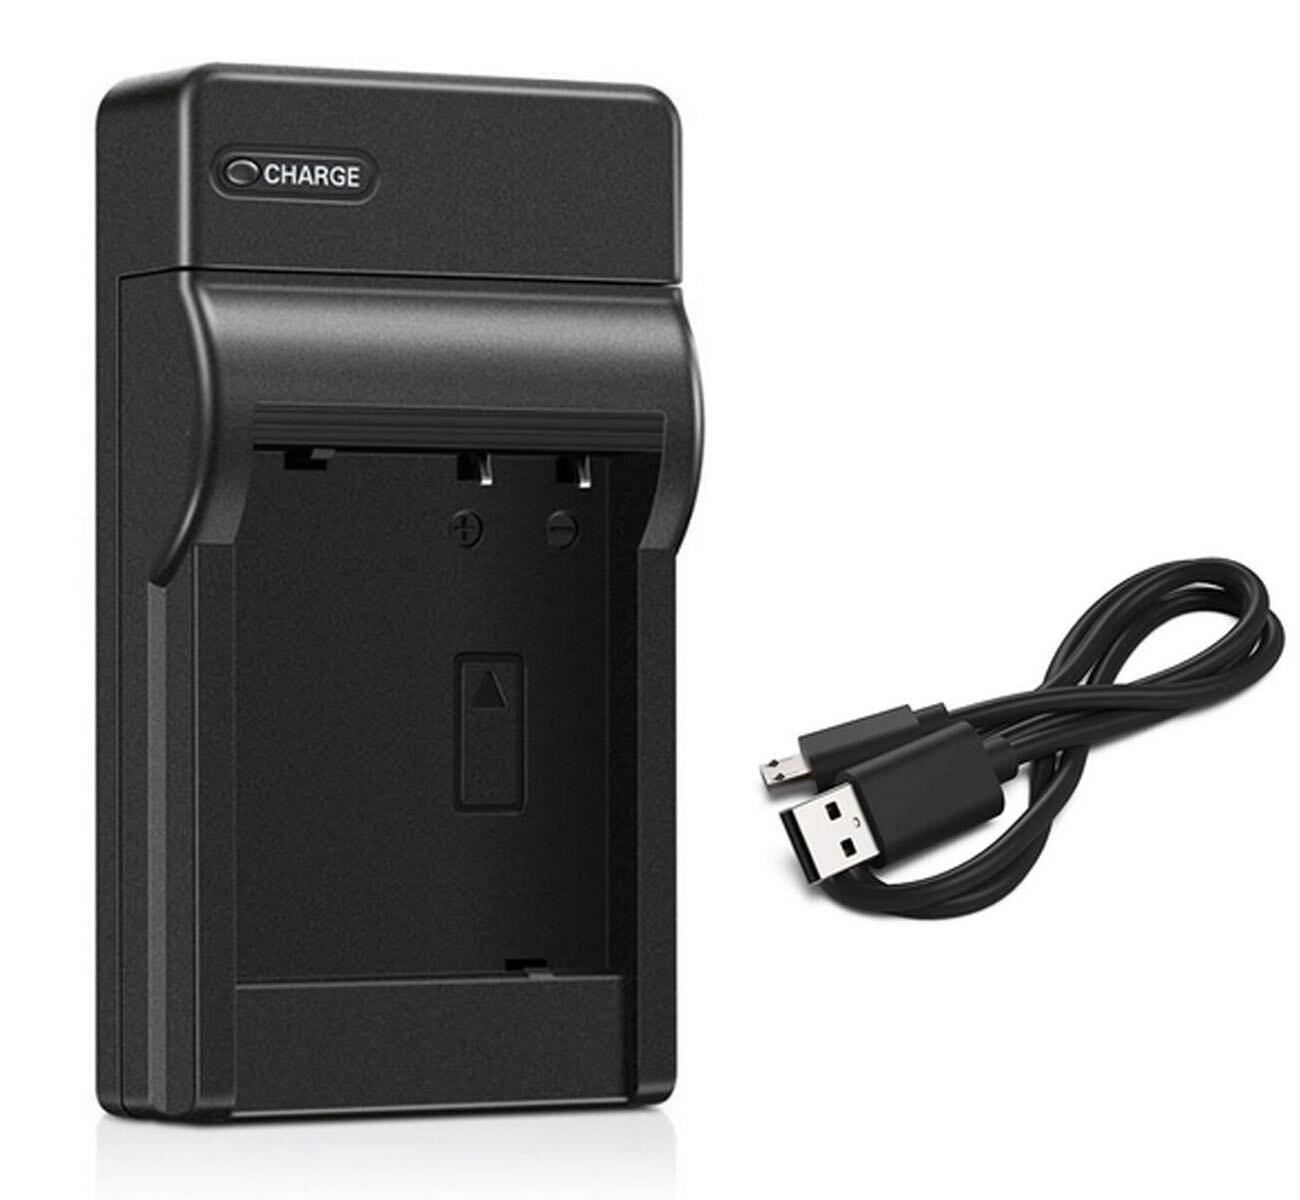 Cargador de batería para cámara Digital Samsung ST30, ST80, ST90, ST91, ST93, ST94, ST95, ST100, ST150F, ST151F, ST152F, ST700, ST6500